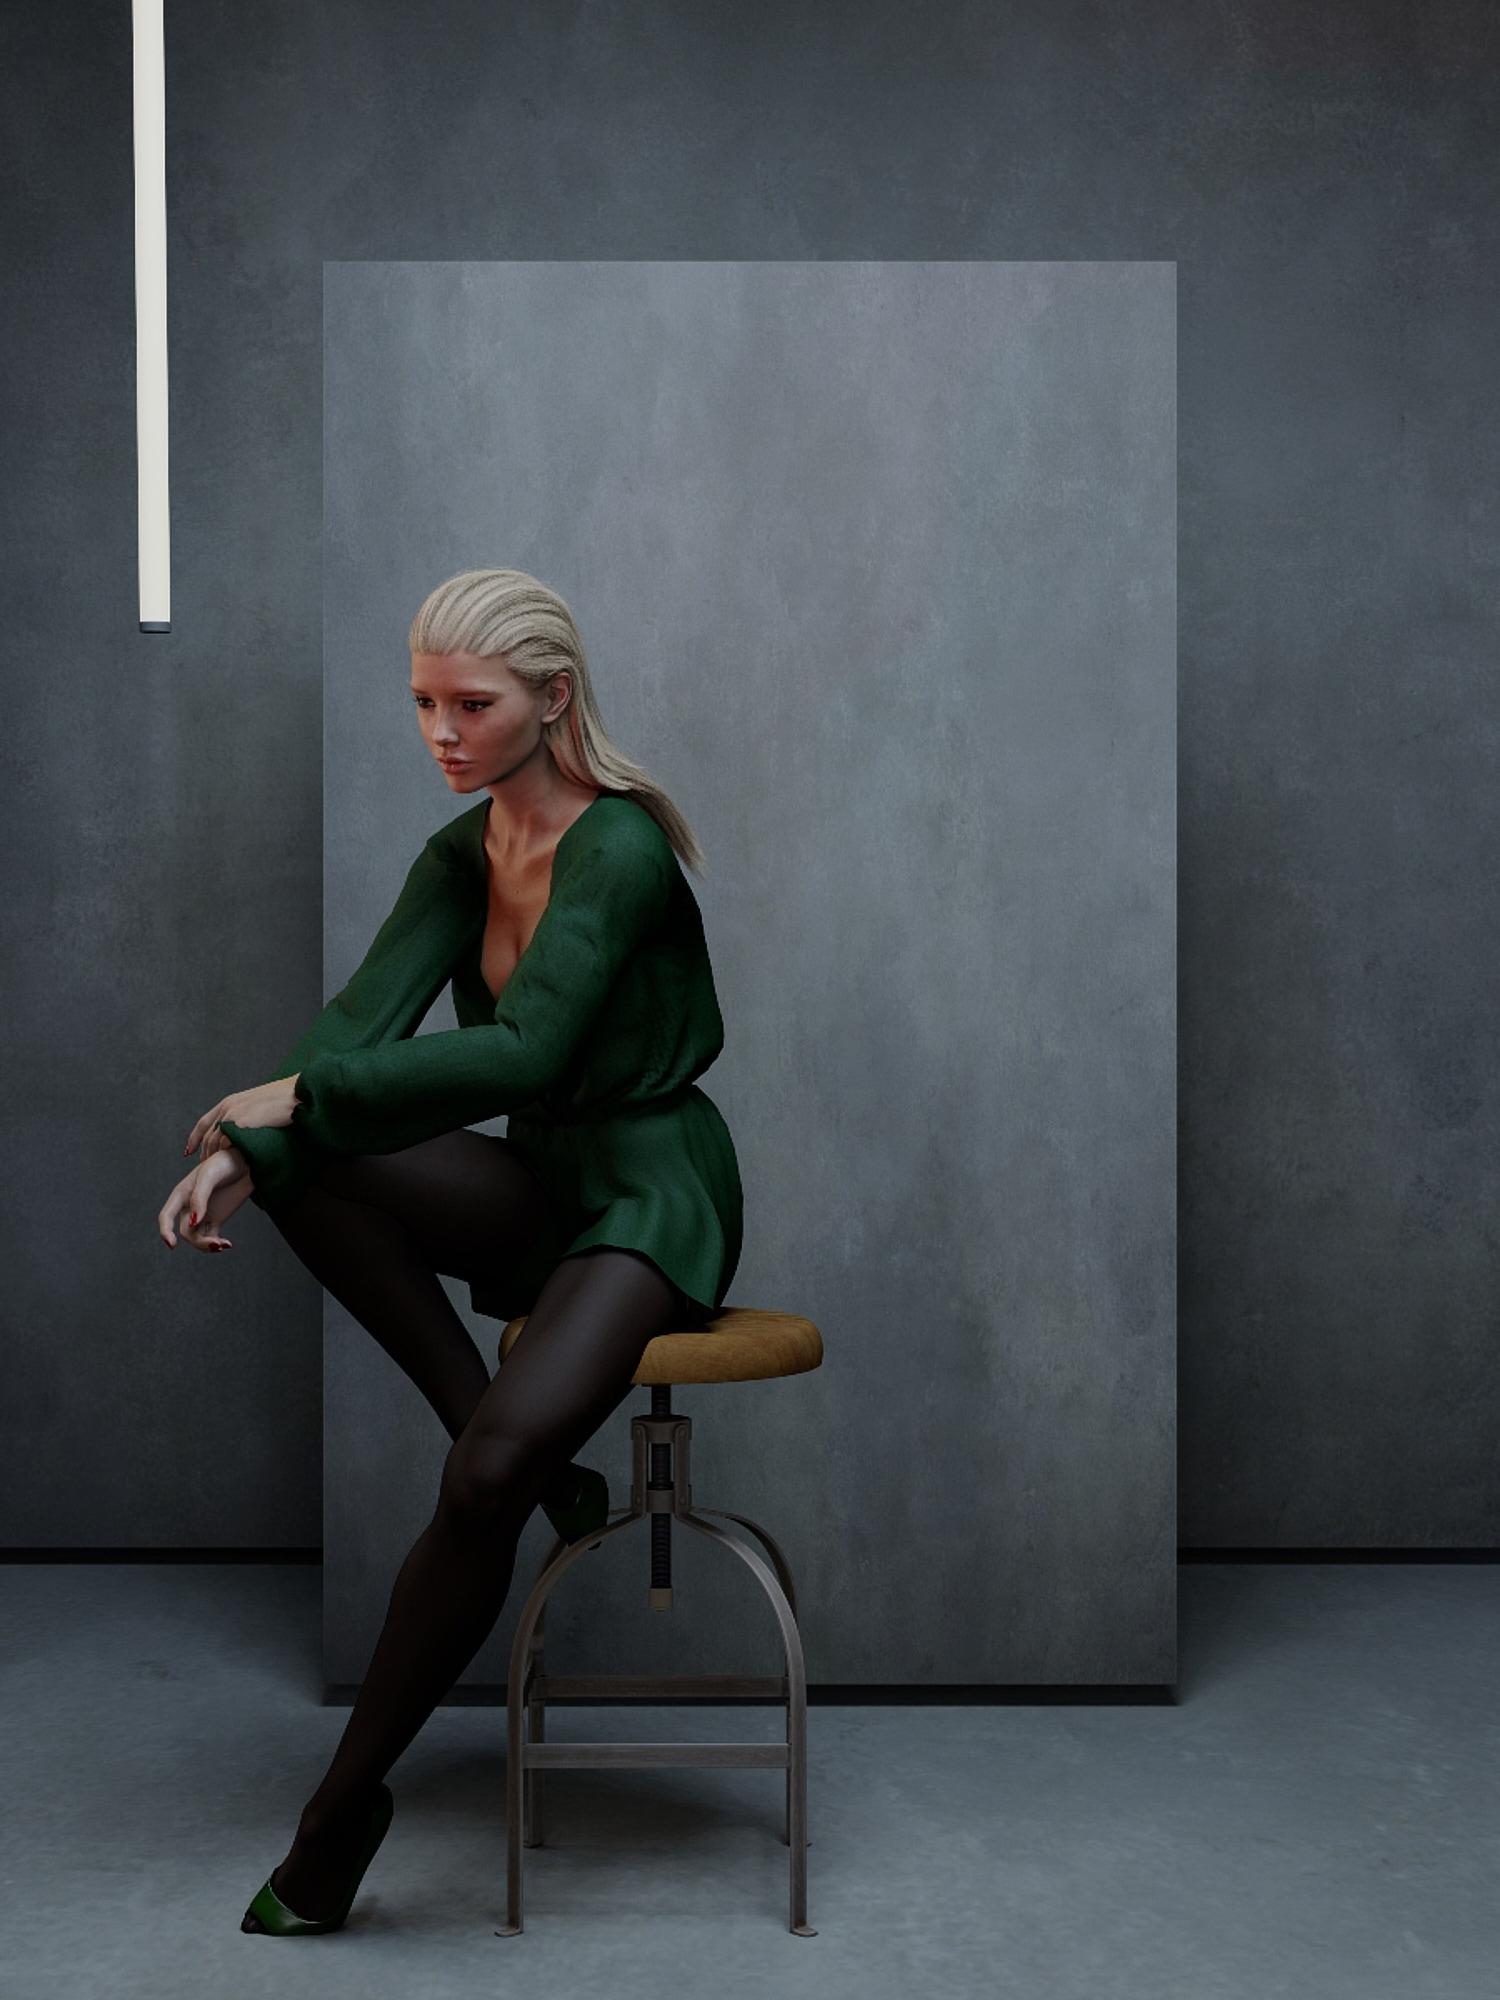 Concept of portrait in studio of Alison Cossenet for Empara